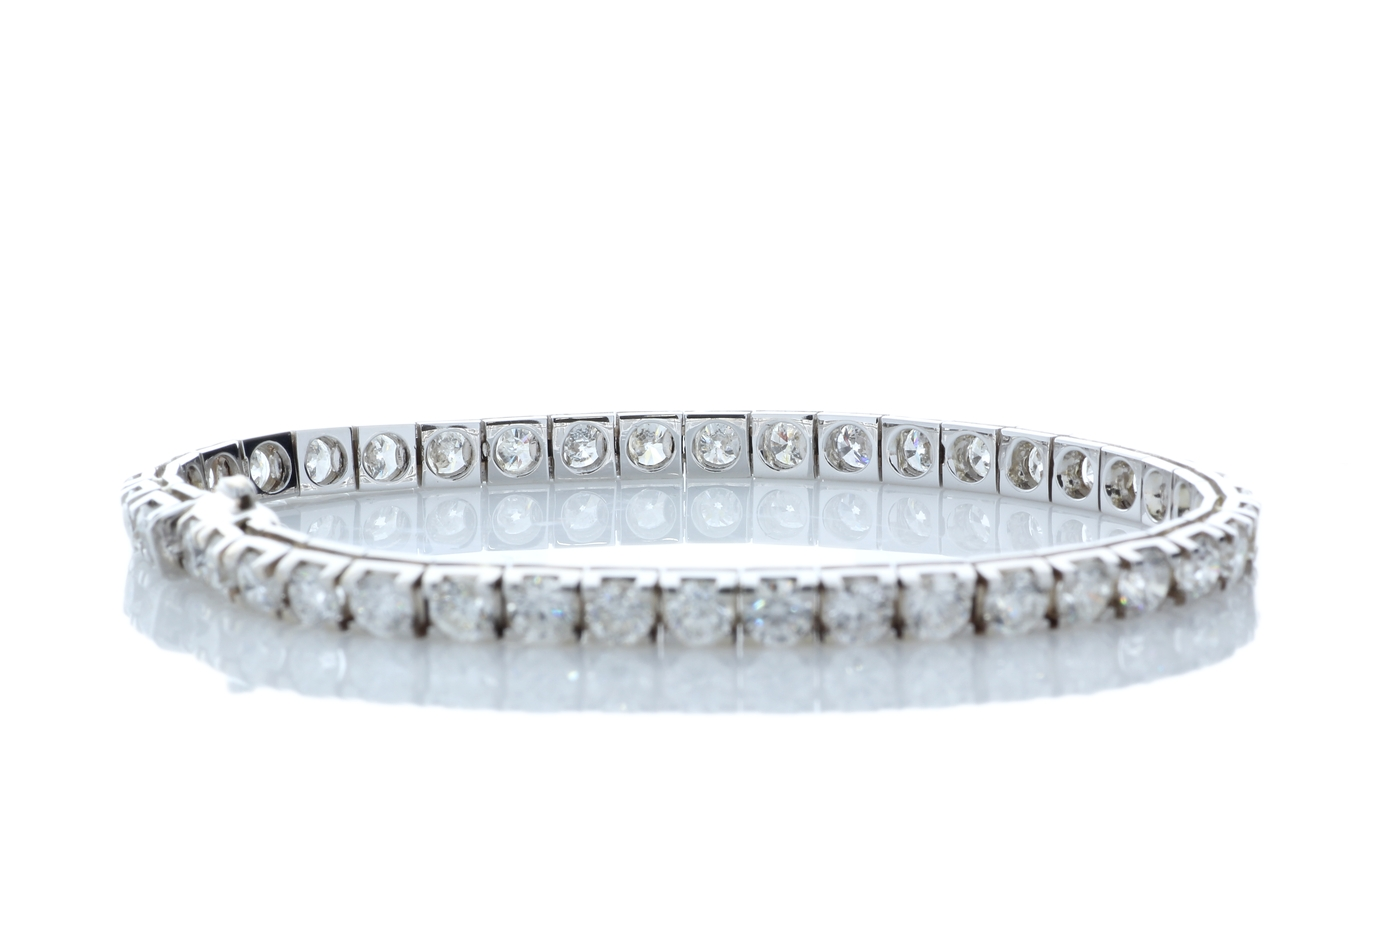 Lot 13 - 18k White Gold Tennis Diamond Bracelet 9.58 Carats